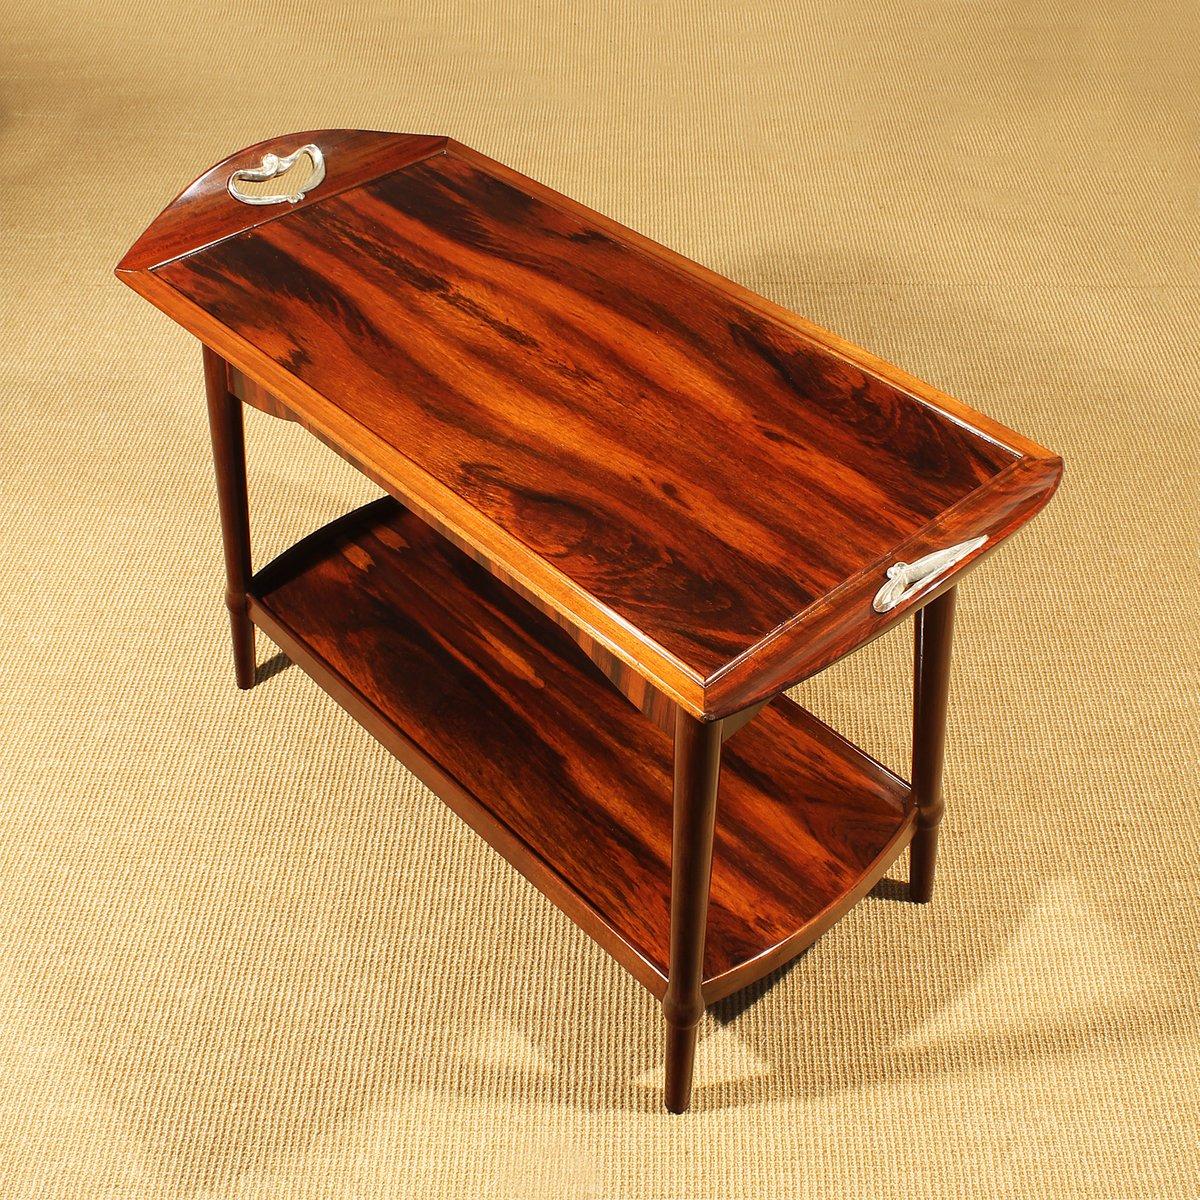 french art nouveau dessert table 1900 for sale at pamono. Black Bedroom Furniture Sets. Home Design Ideas